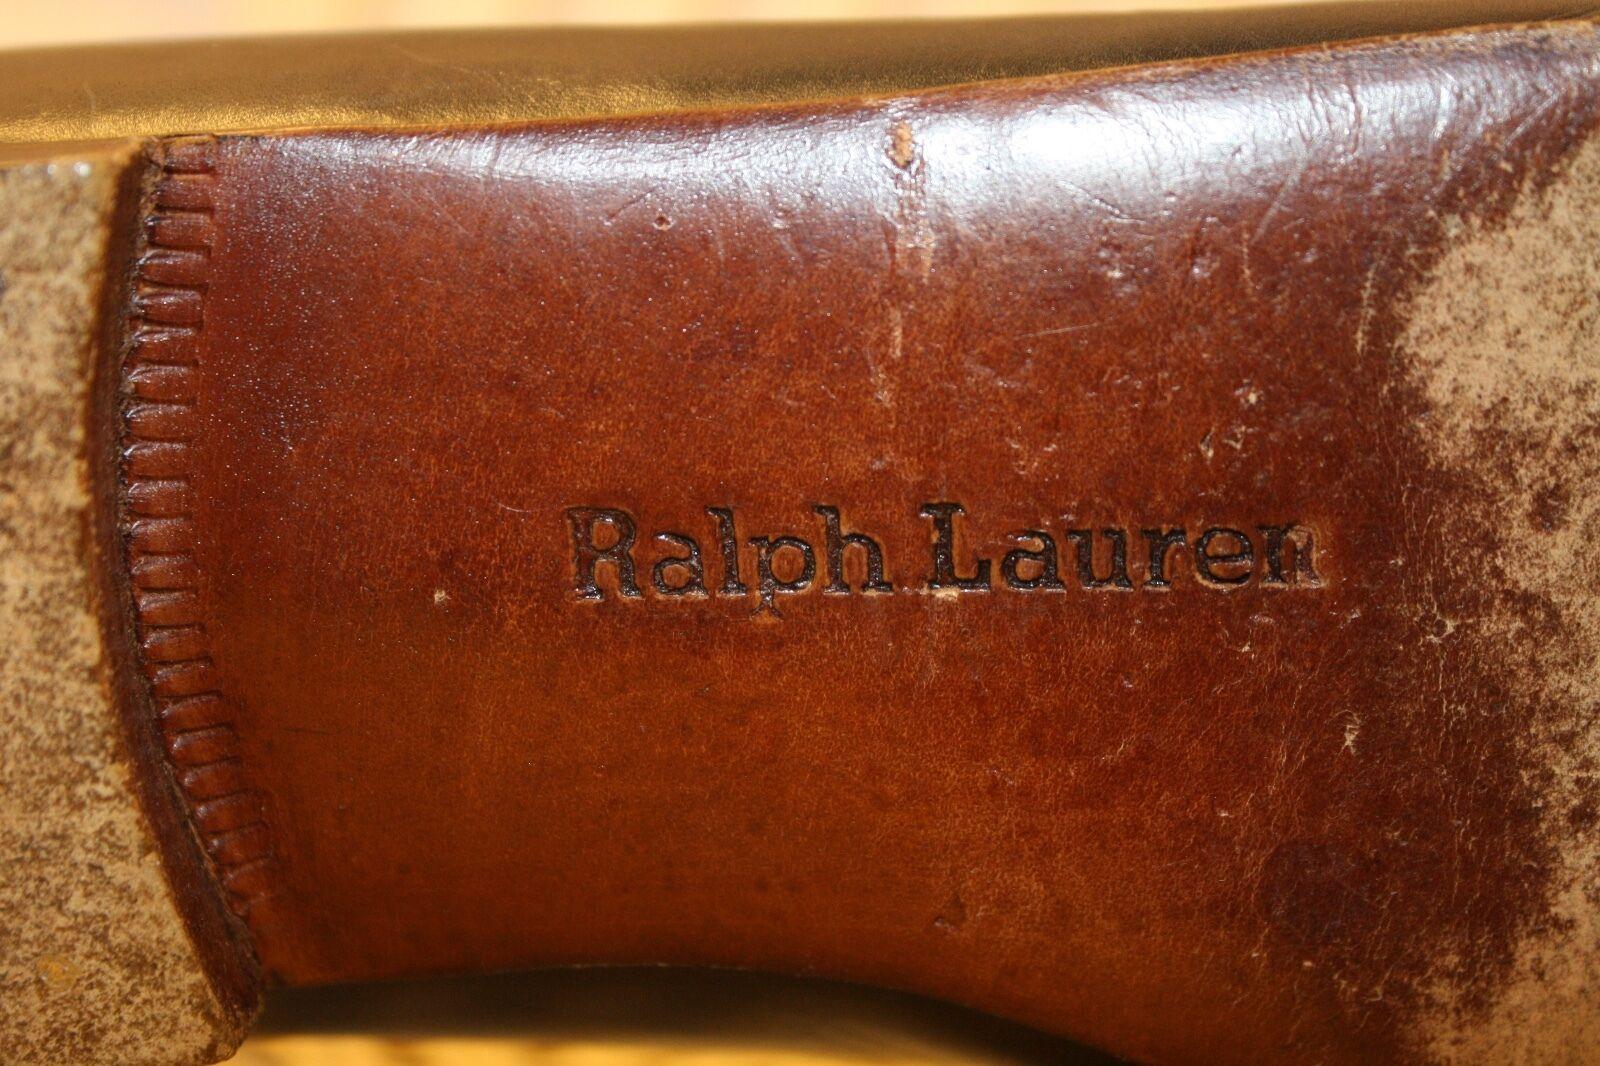 RALPH RALPH RALPH LAUREN 80's Navy bluee Leather Military Nautical Flats Loafers 5.5B ITALY 14eca0